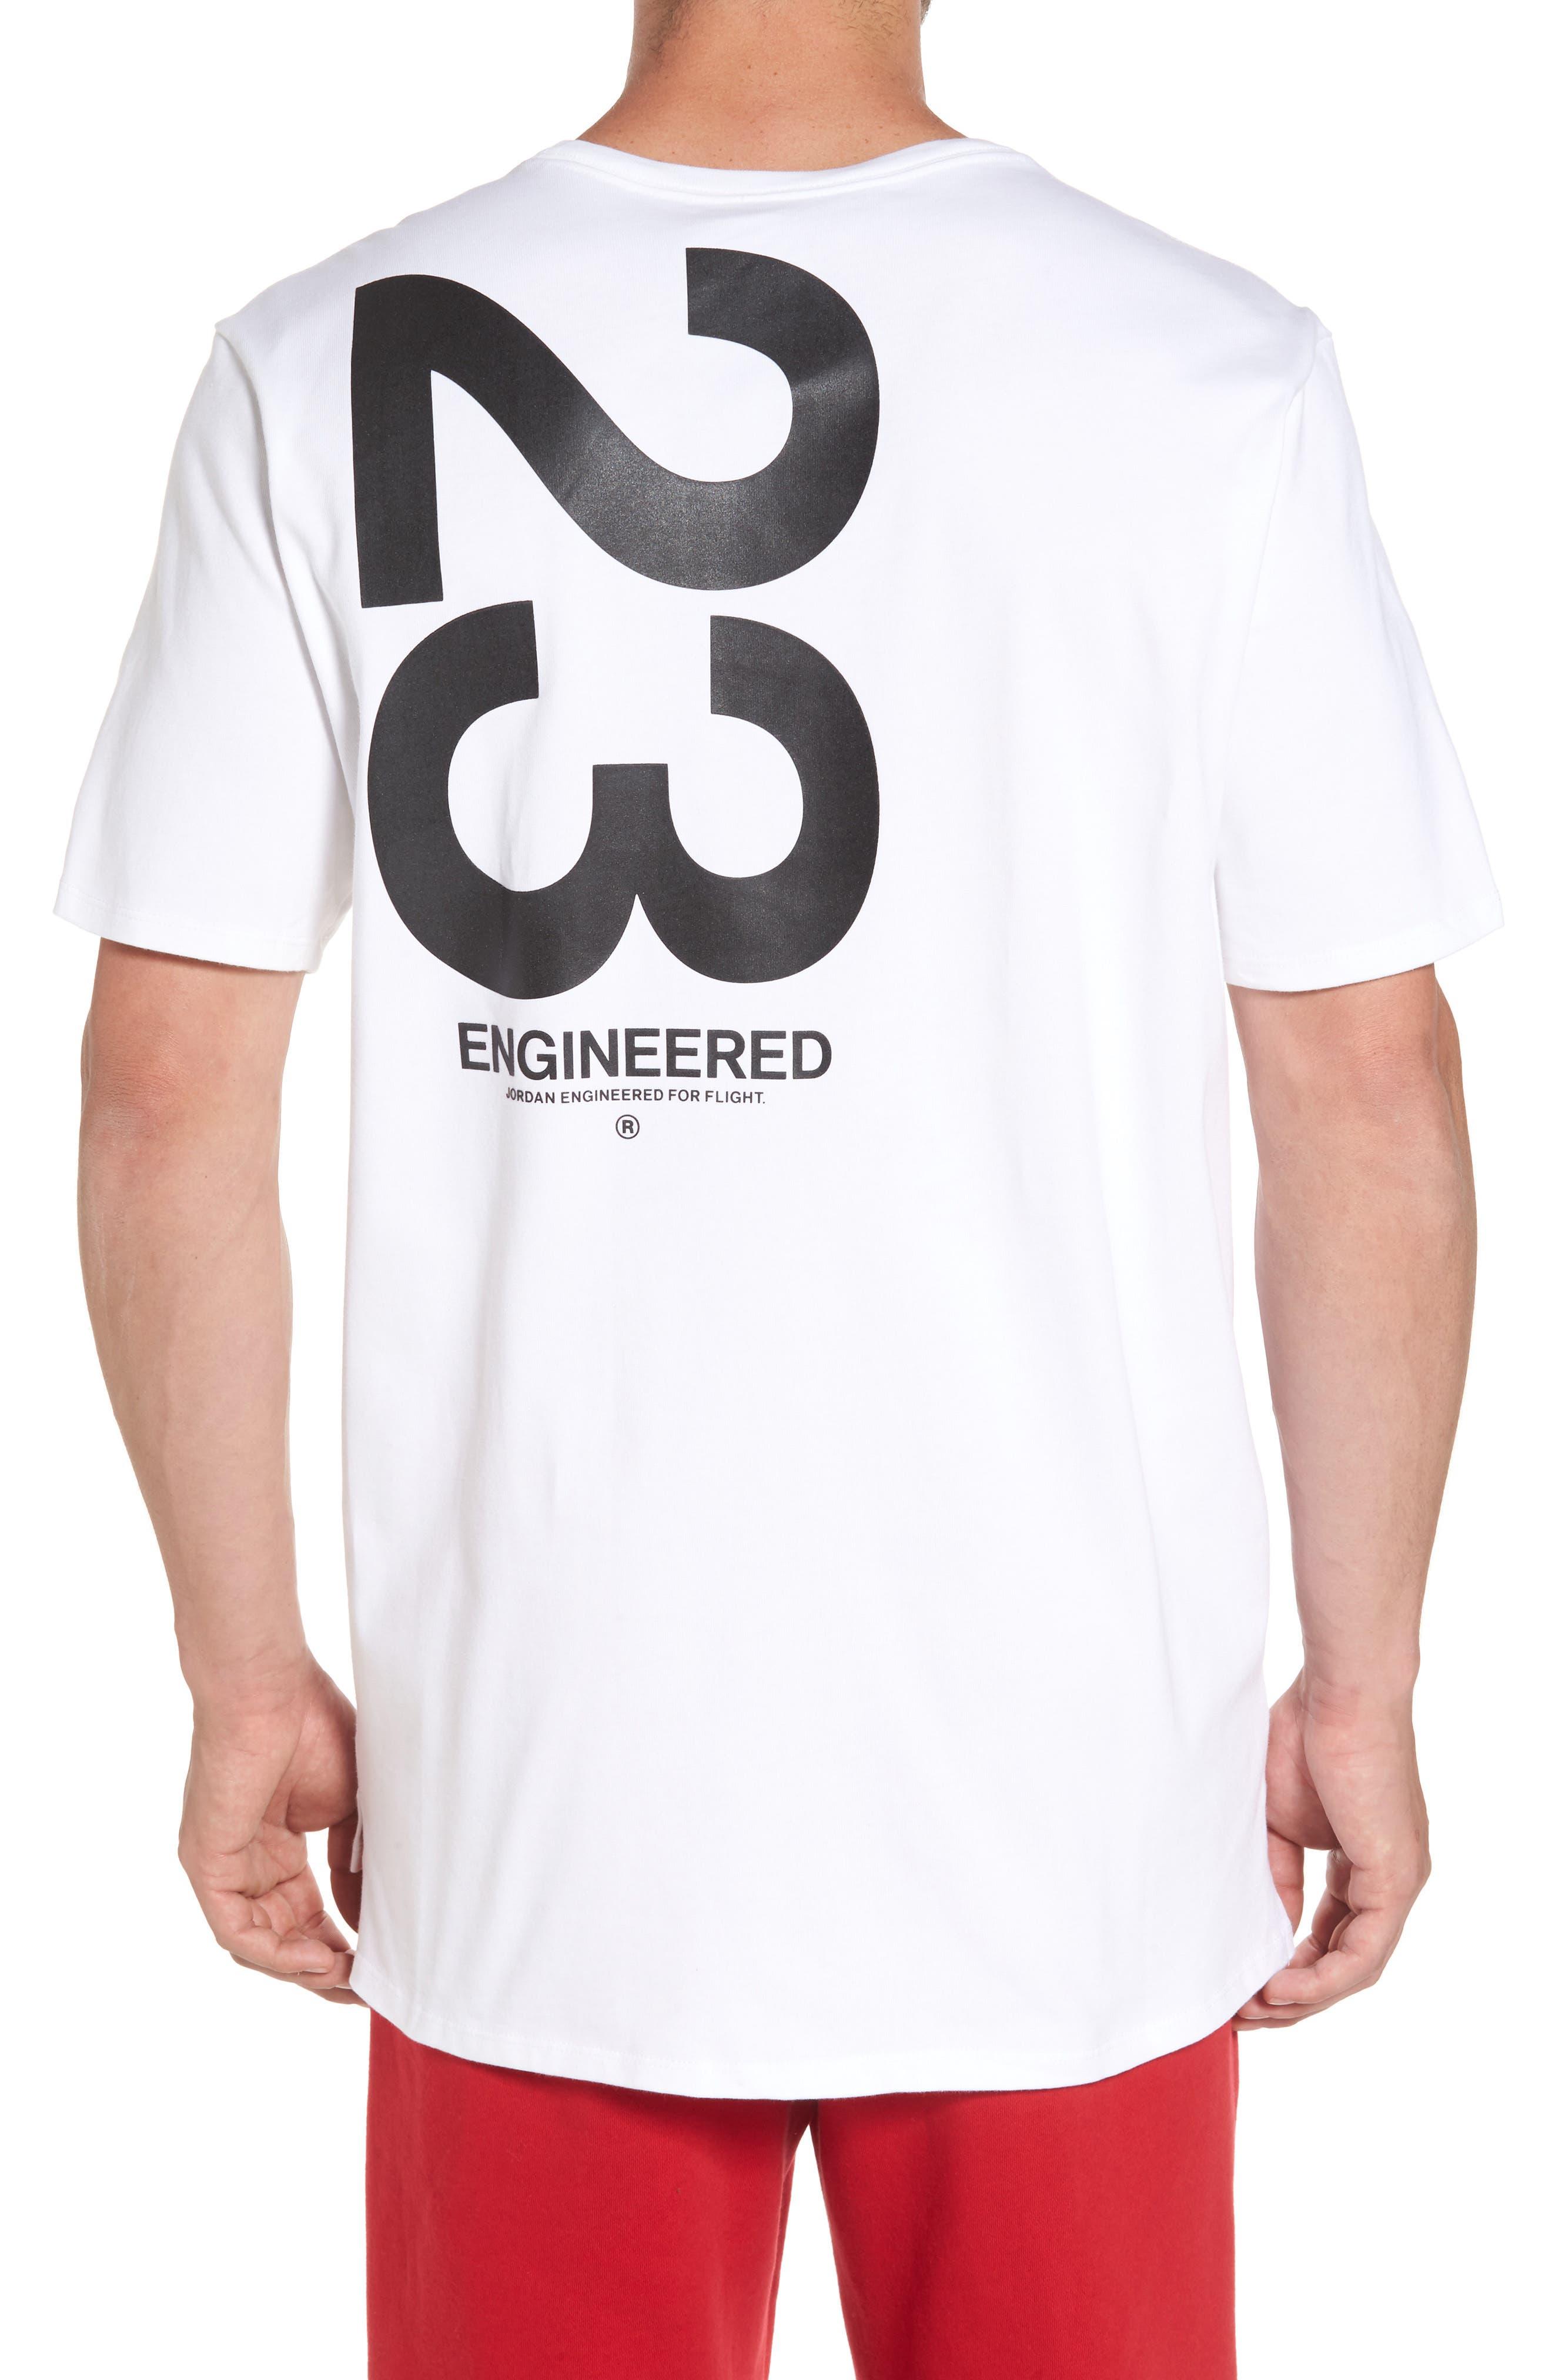 Sportswear 23 Engineered T-Shirt,                             Alternate thumbnail 2, color,                             White/ Black